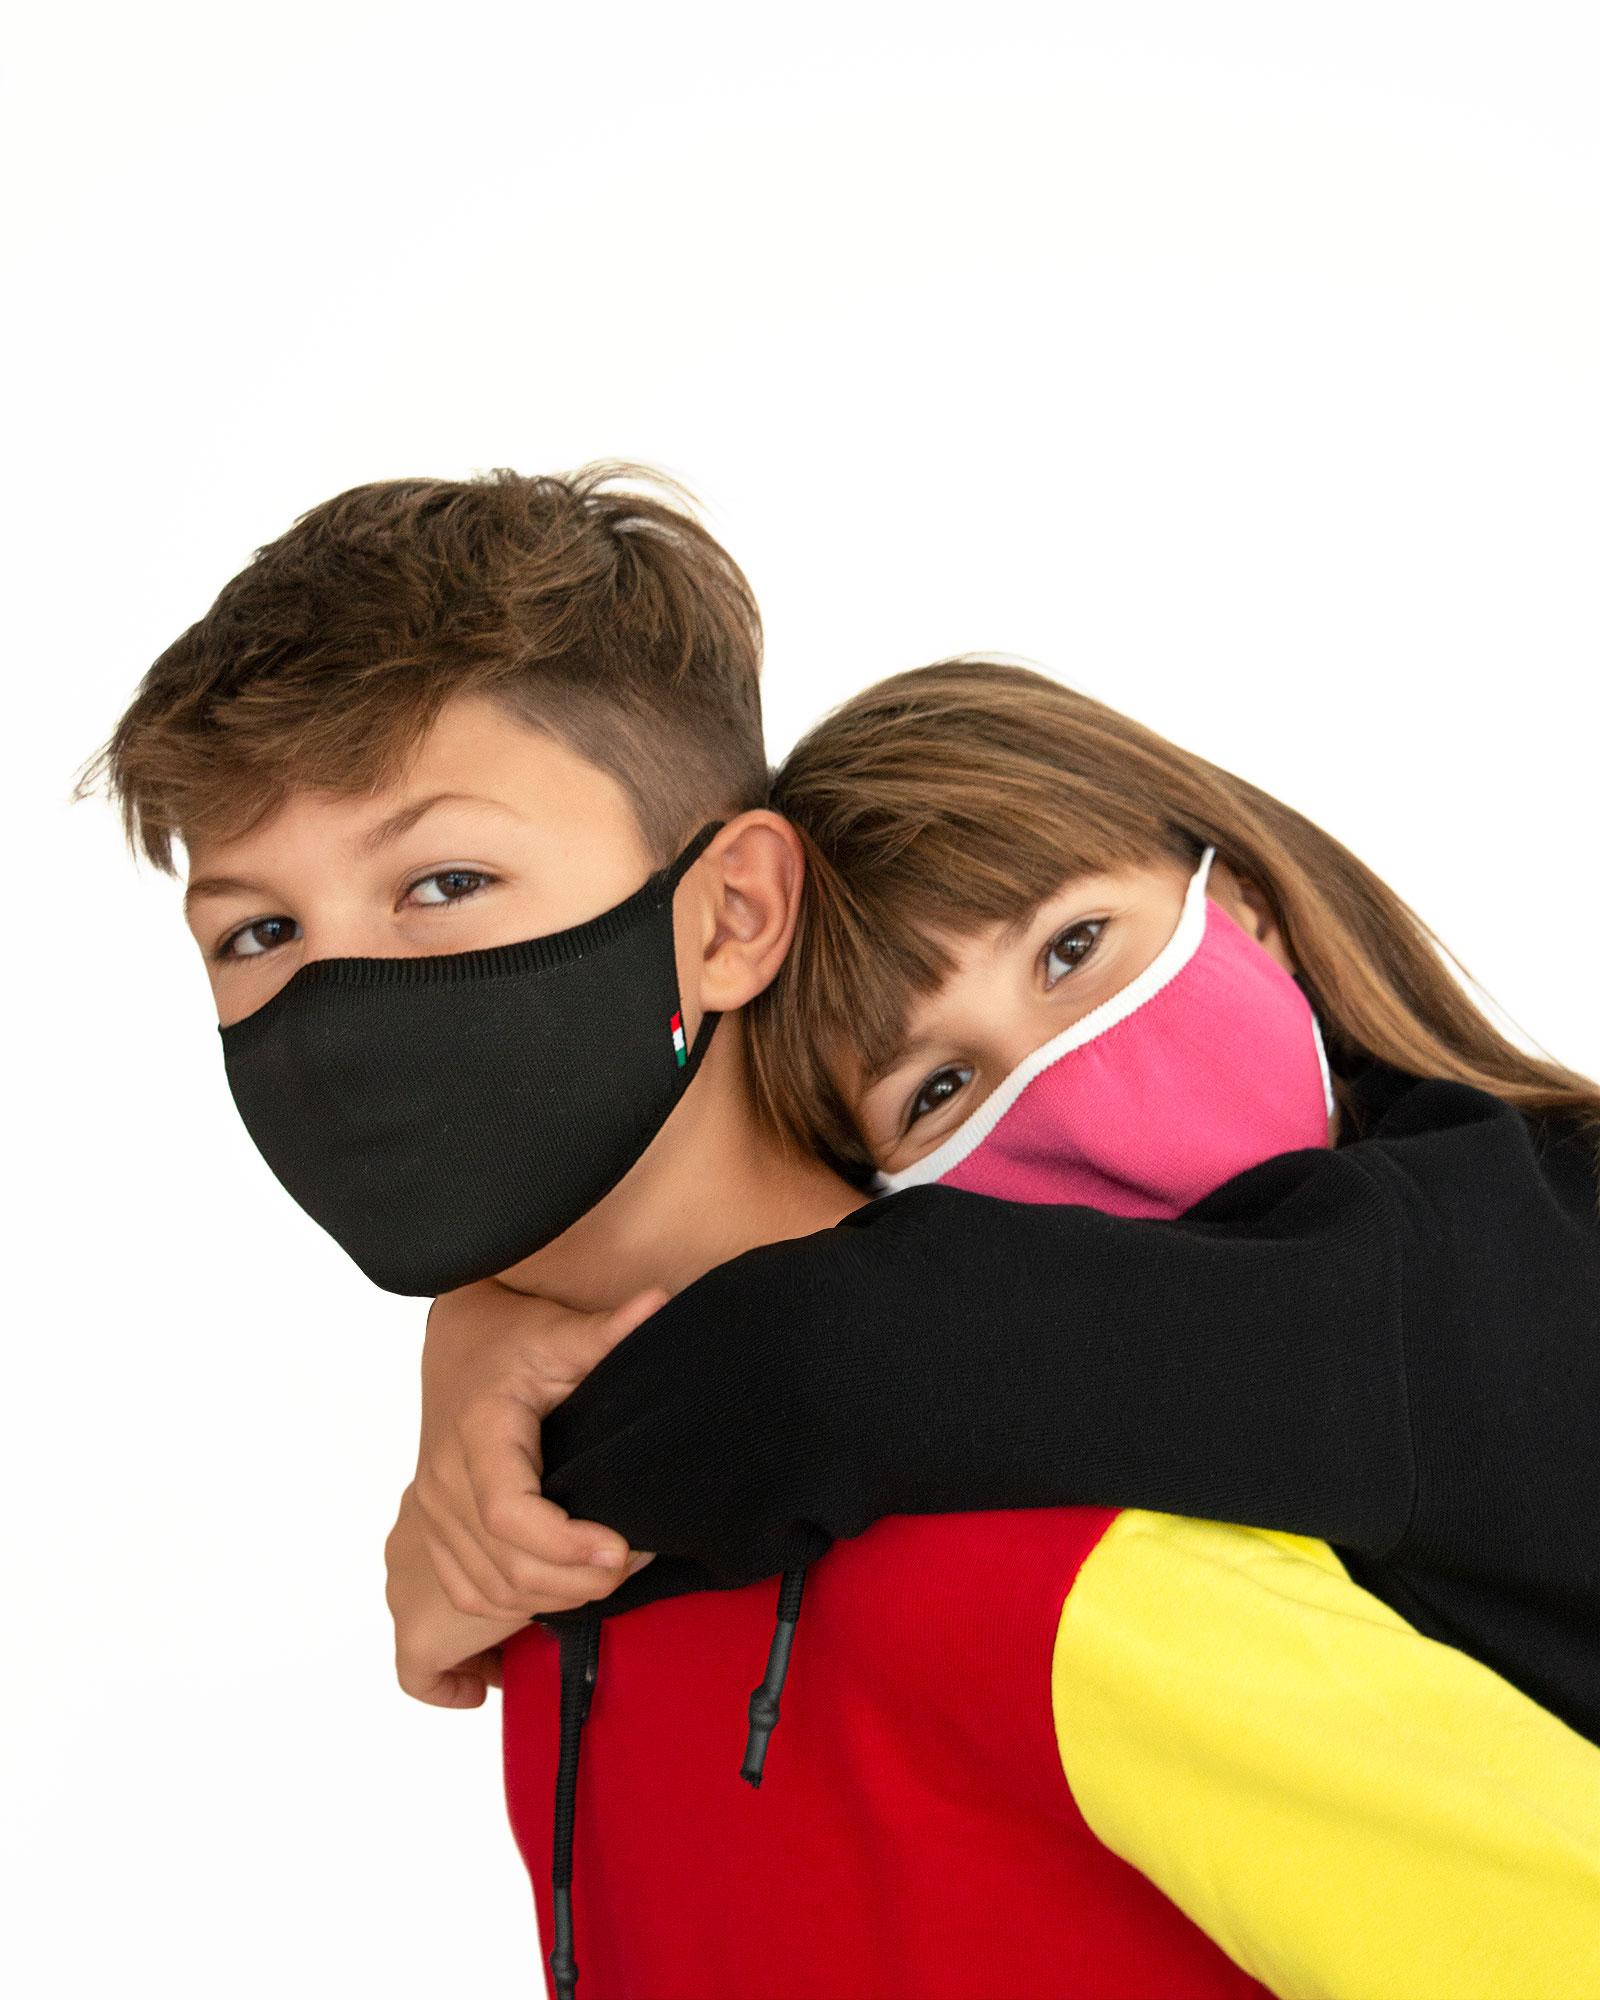 KIDS-MASK-01S-relaxsan-unima-kids-mask_0-MULTI_BOY-girl